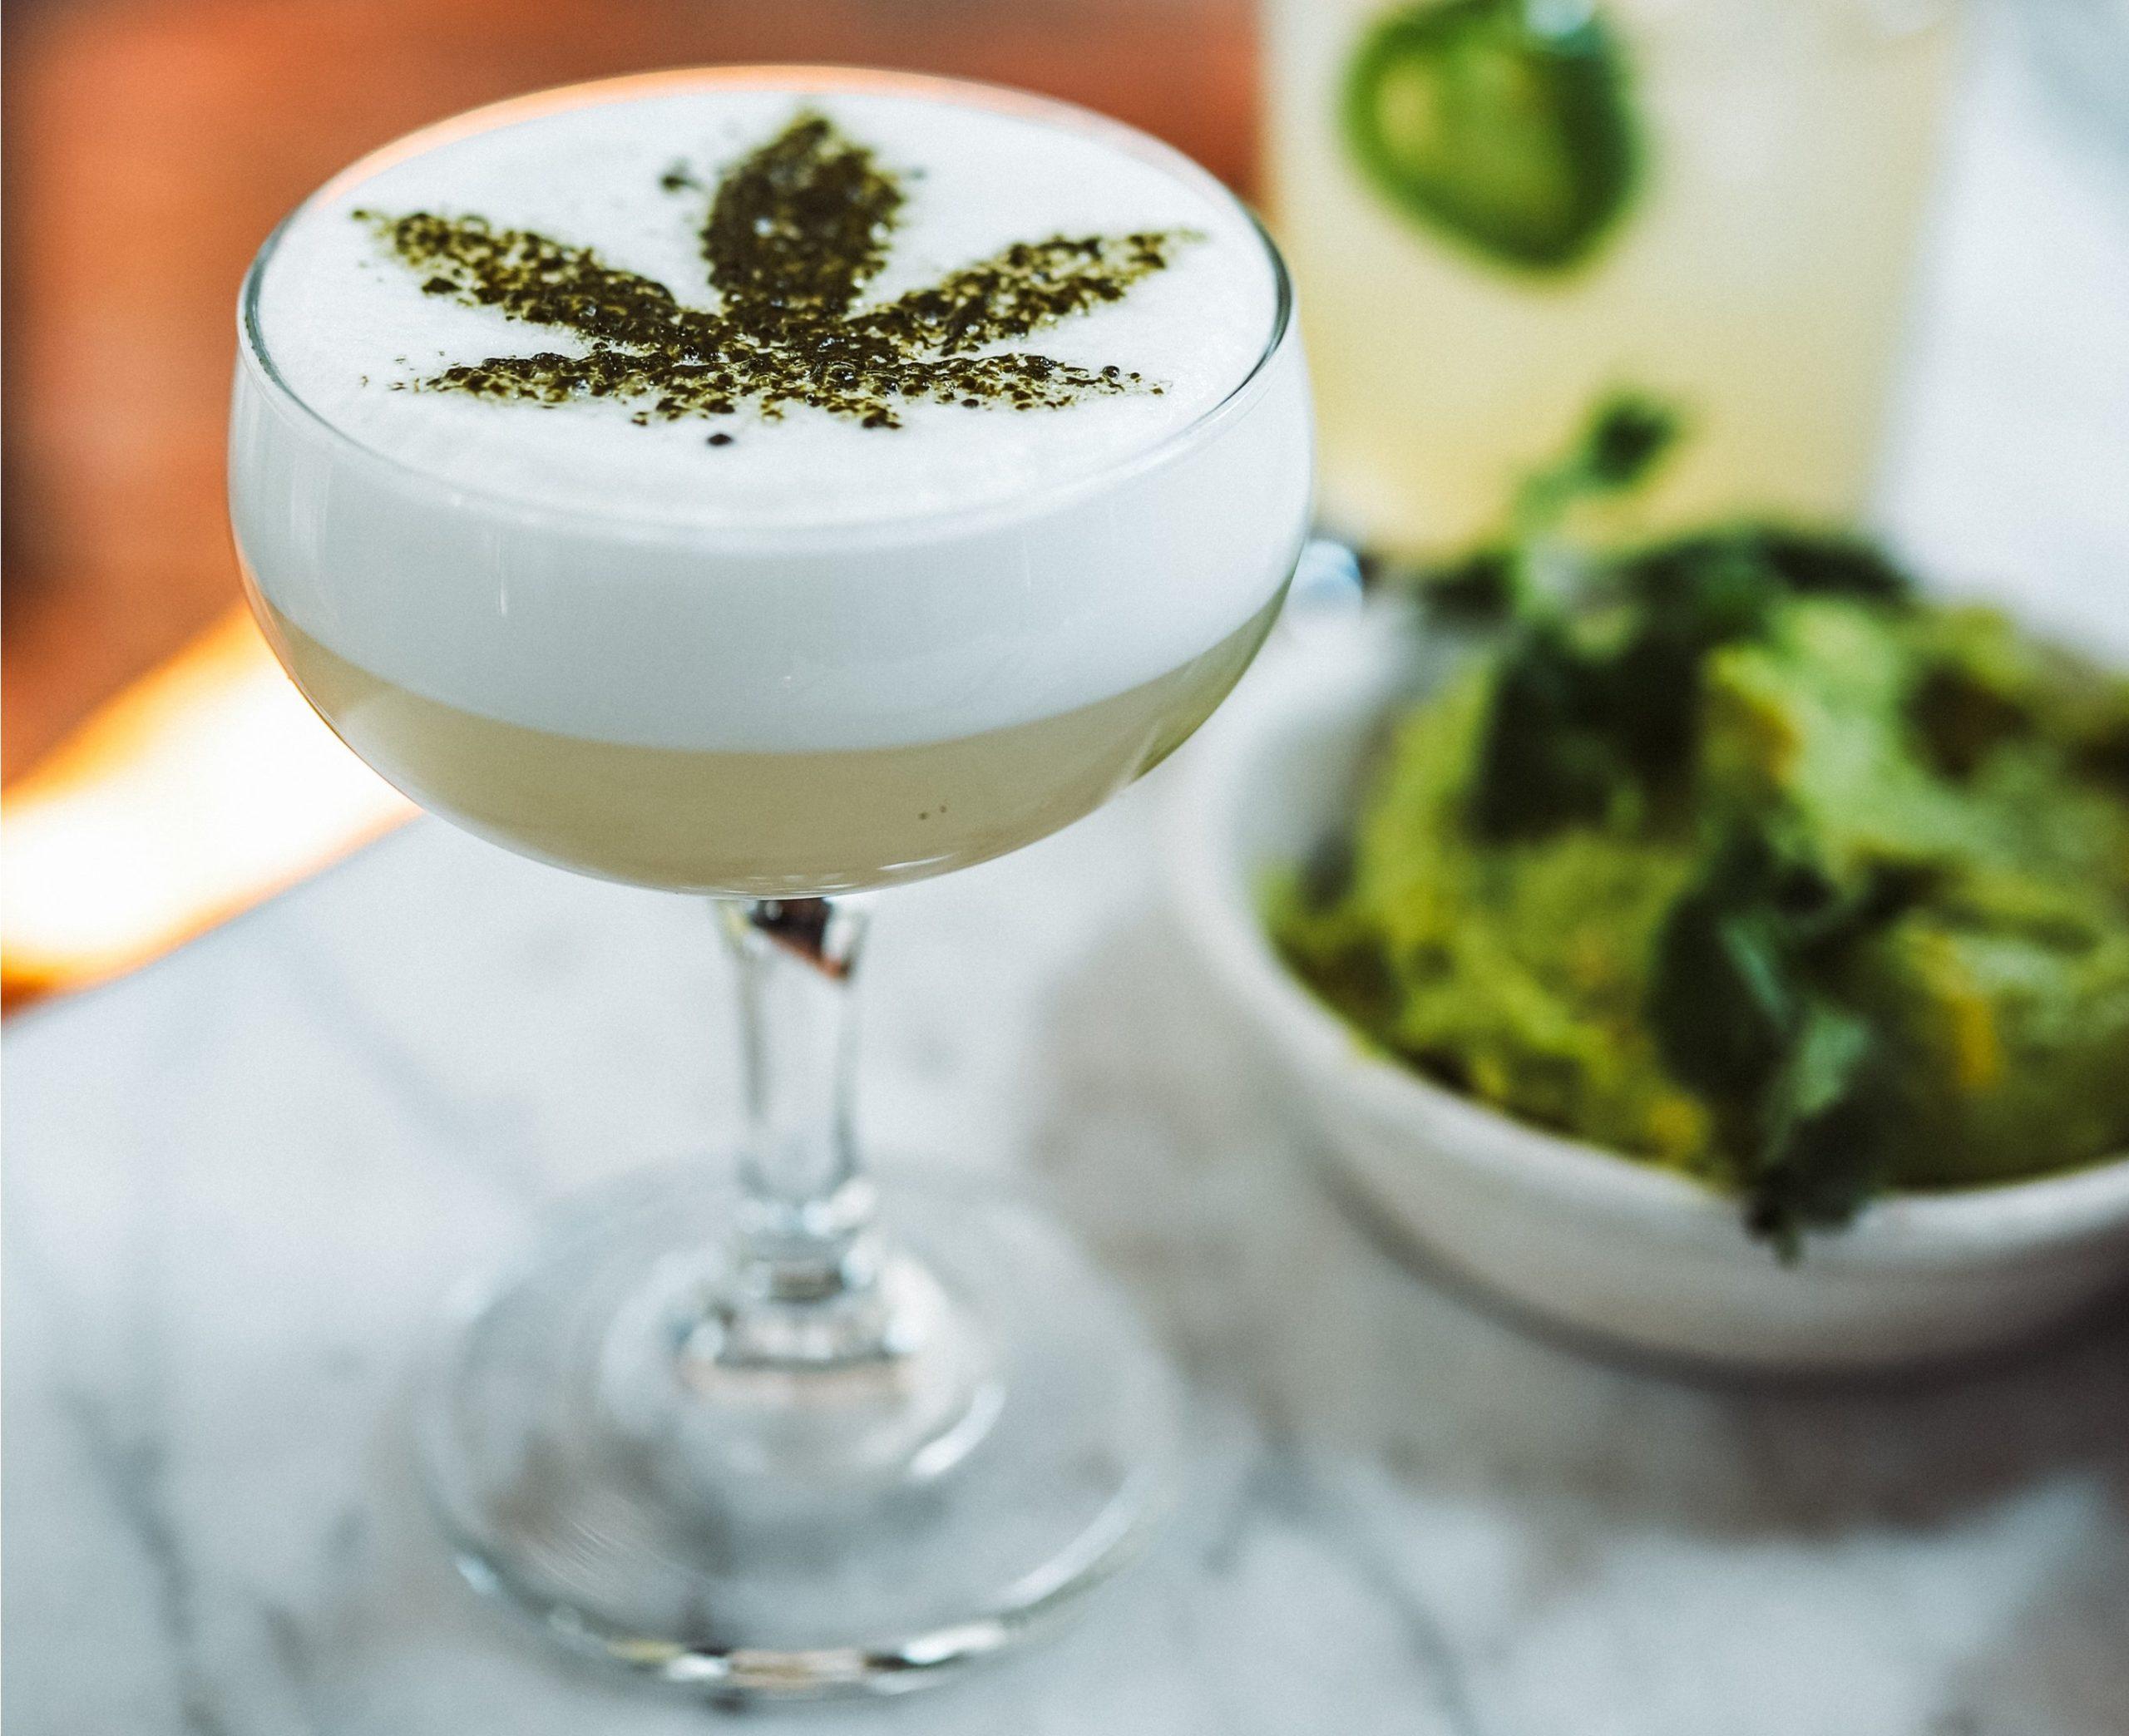 California nixes marijuana- and hemp-infused alcoholic beverages